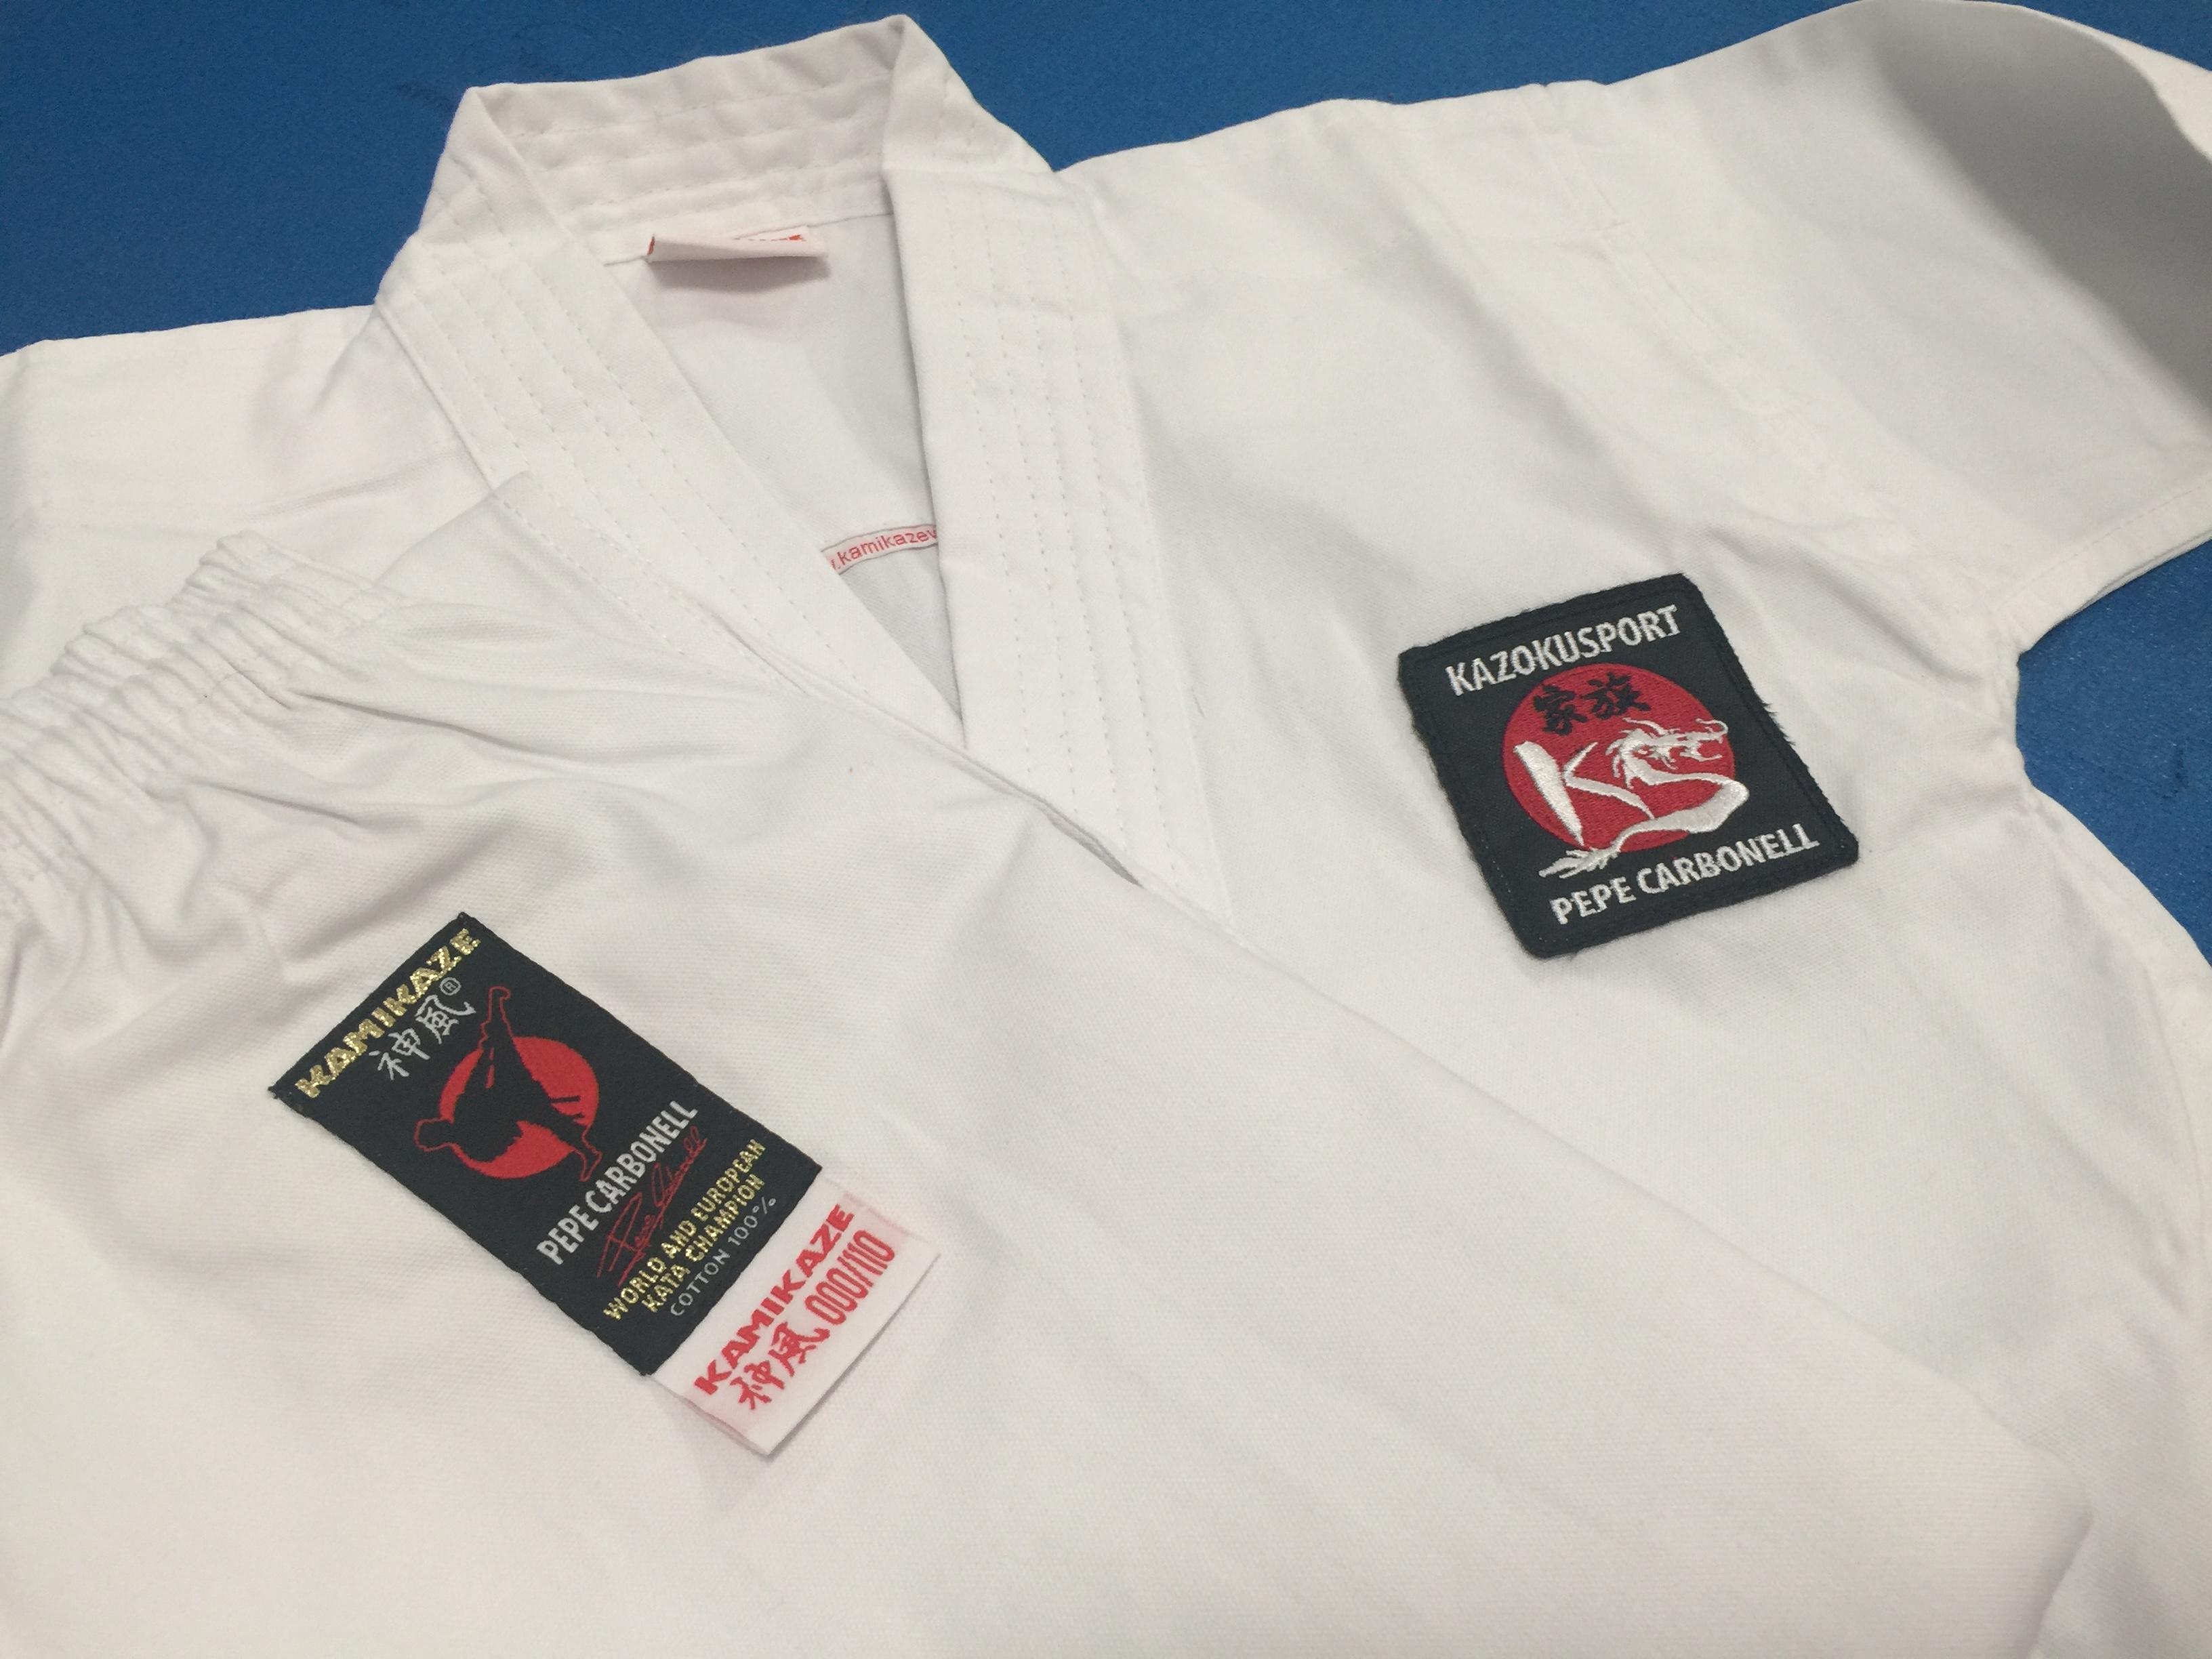 Karategi - Pepe Carbonell